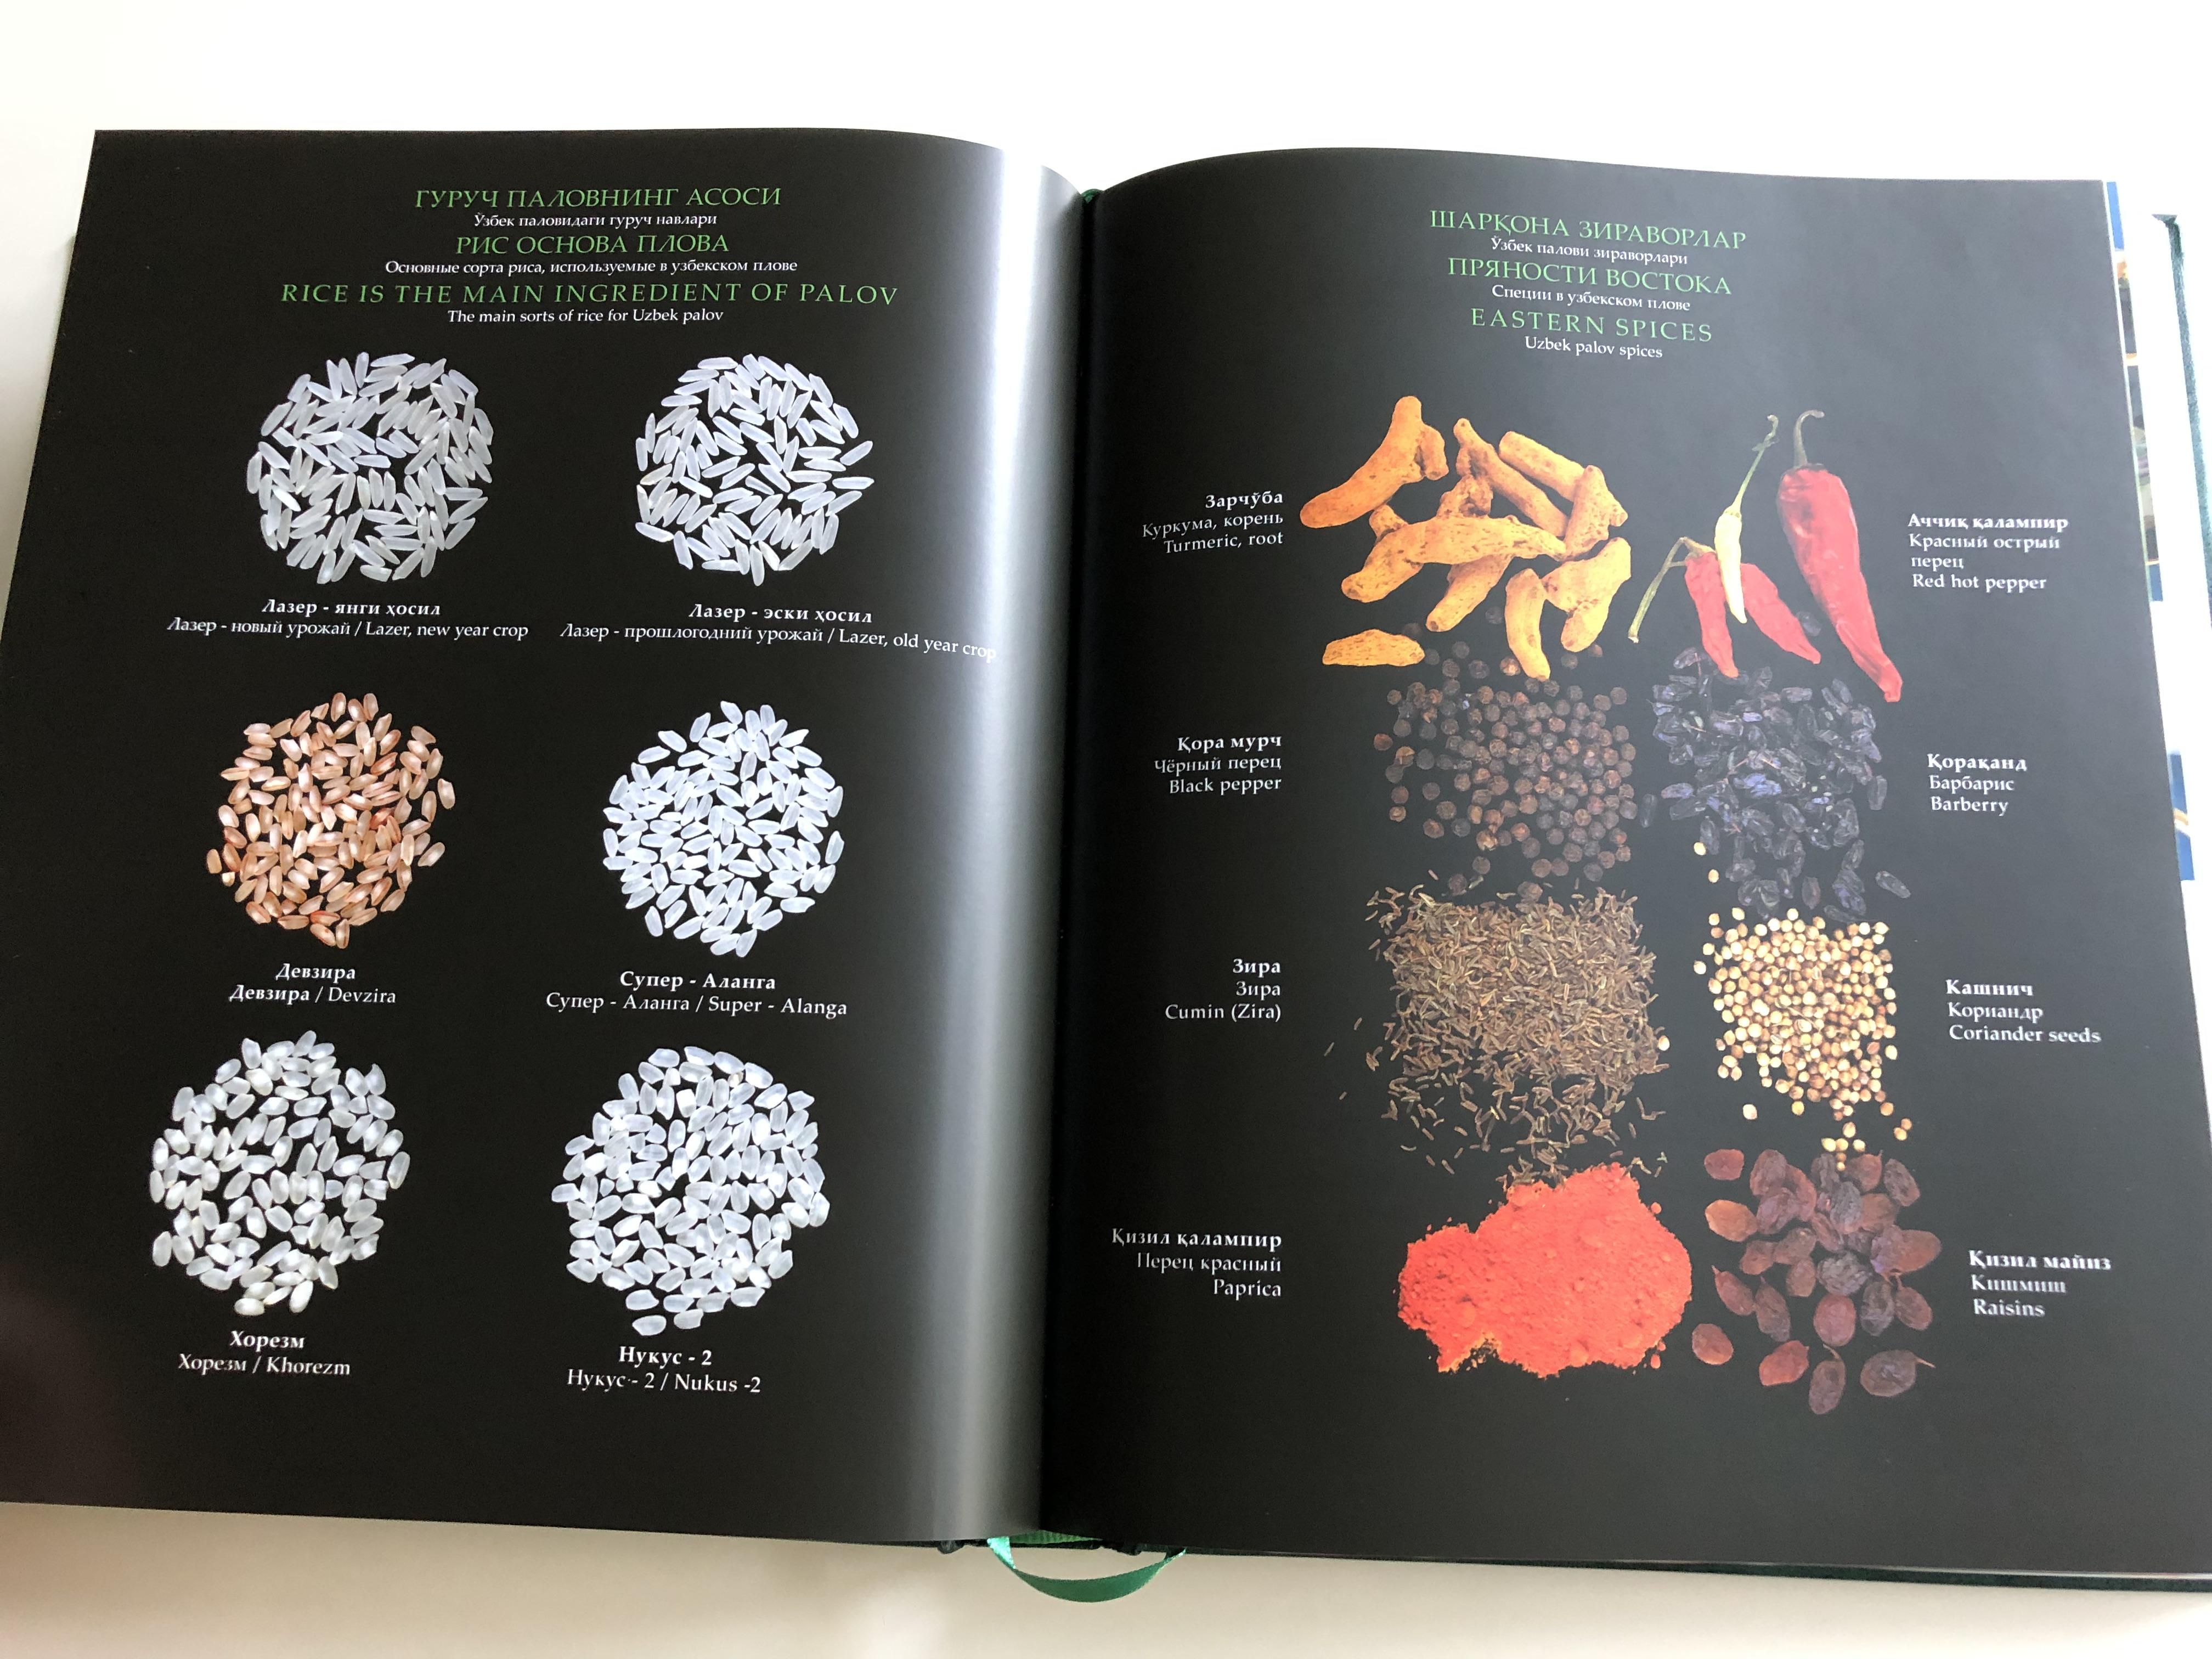 the-art-of-uzbek-cuisine-uzbek-russian-english-edition-hardcover-baktria-press-toshkent-2016-recipes-culture-cuisine-art-31-.jpg